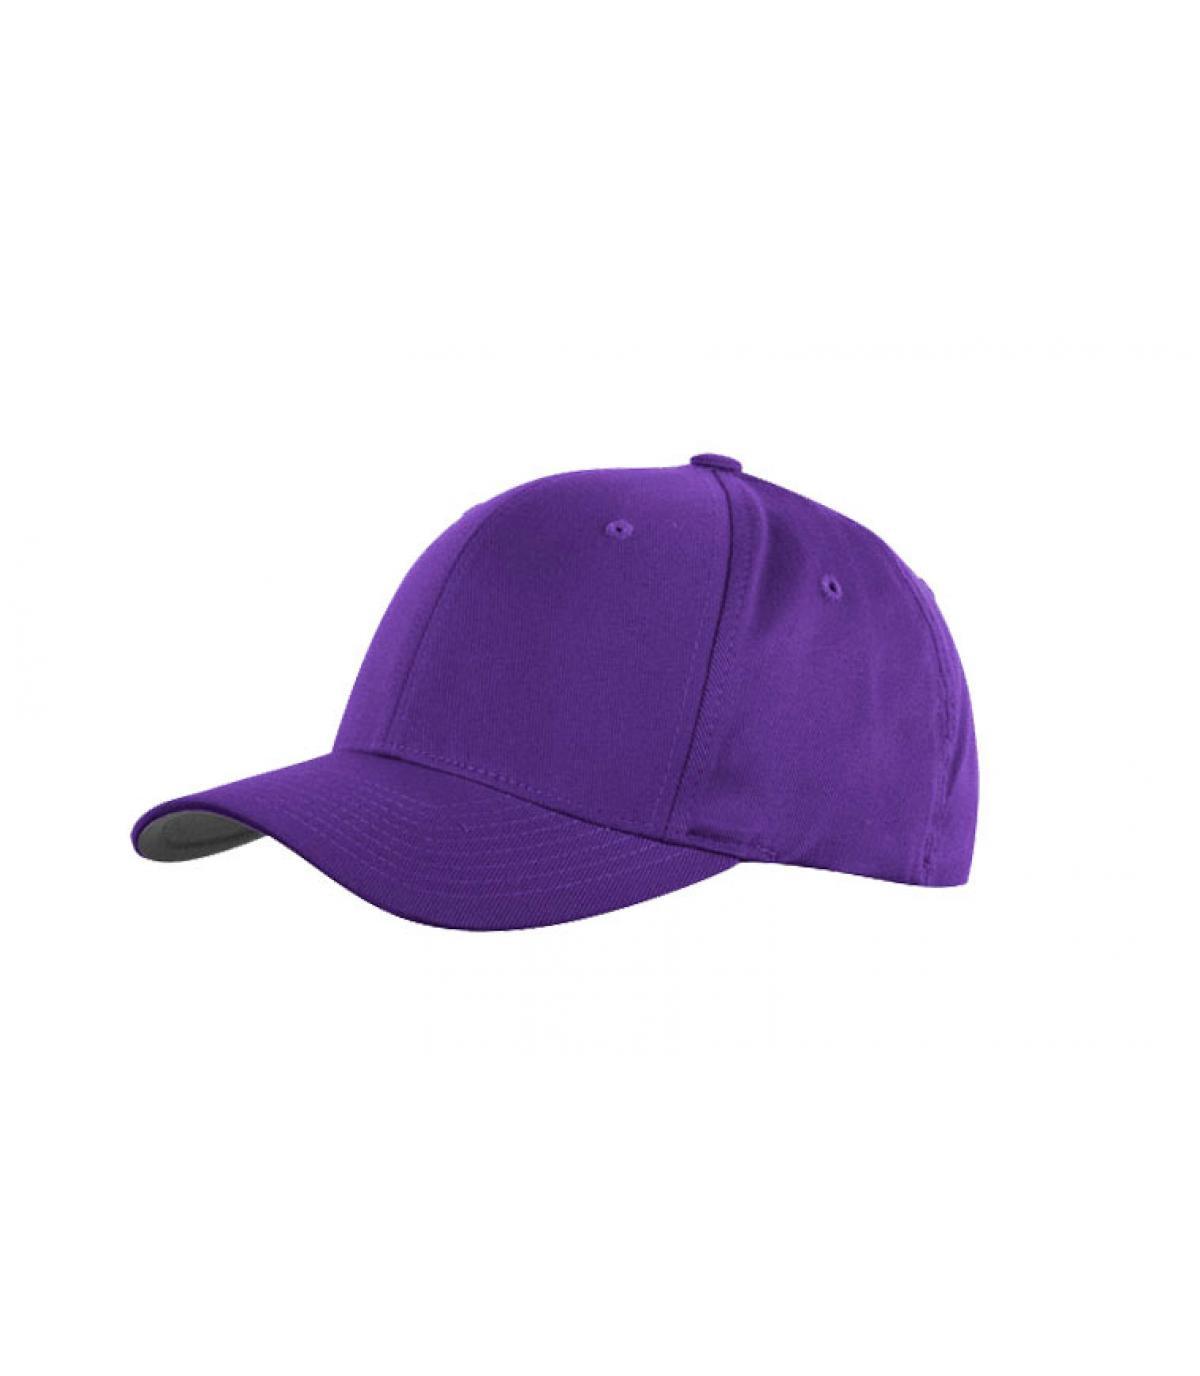 Flexfit cap purple